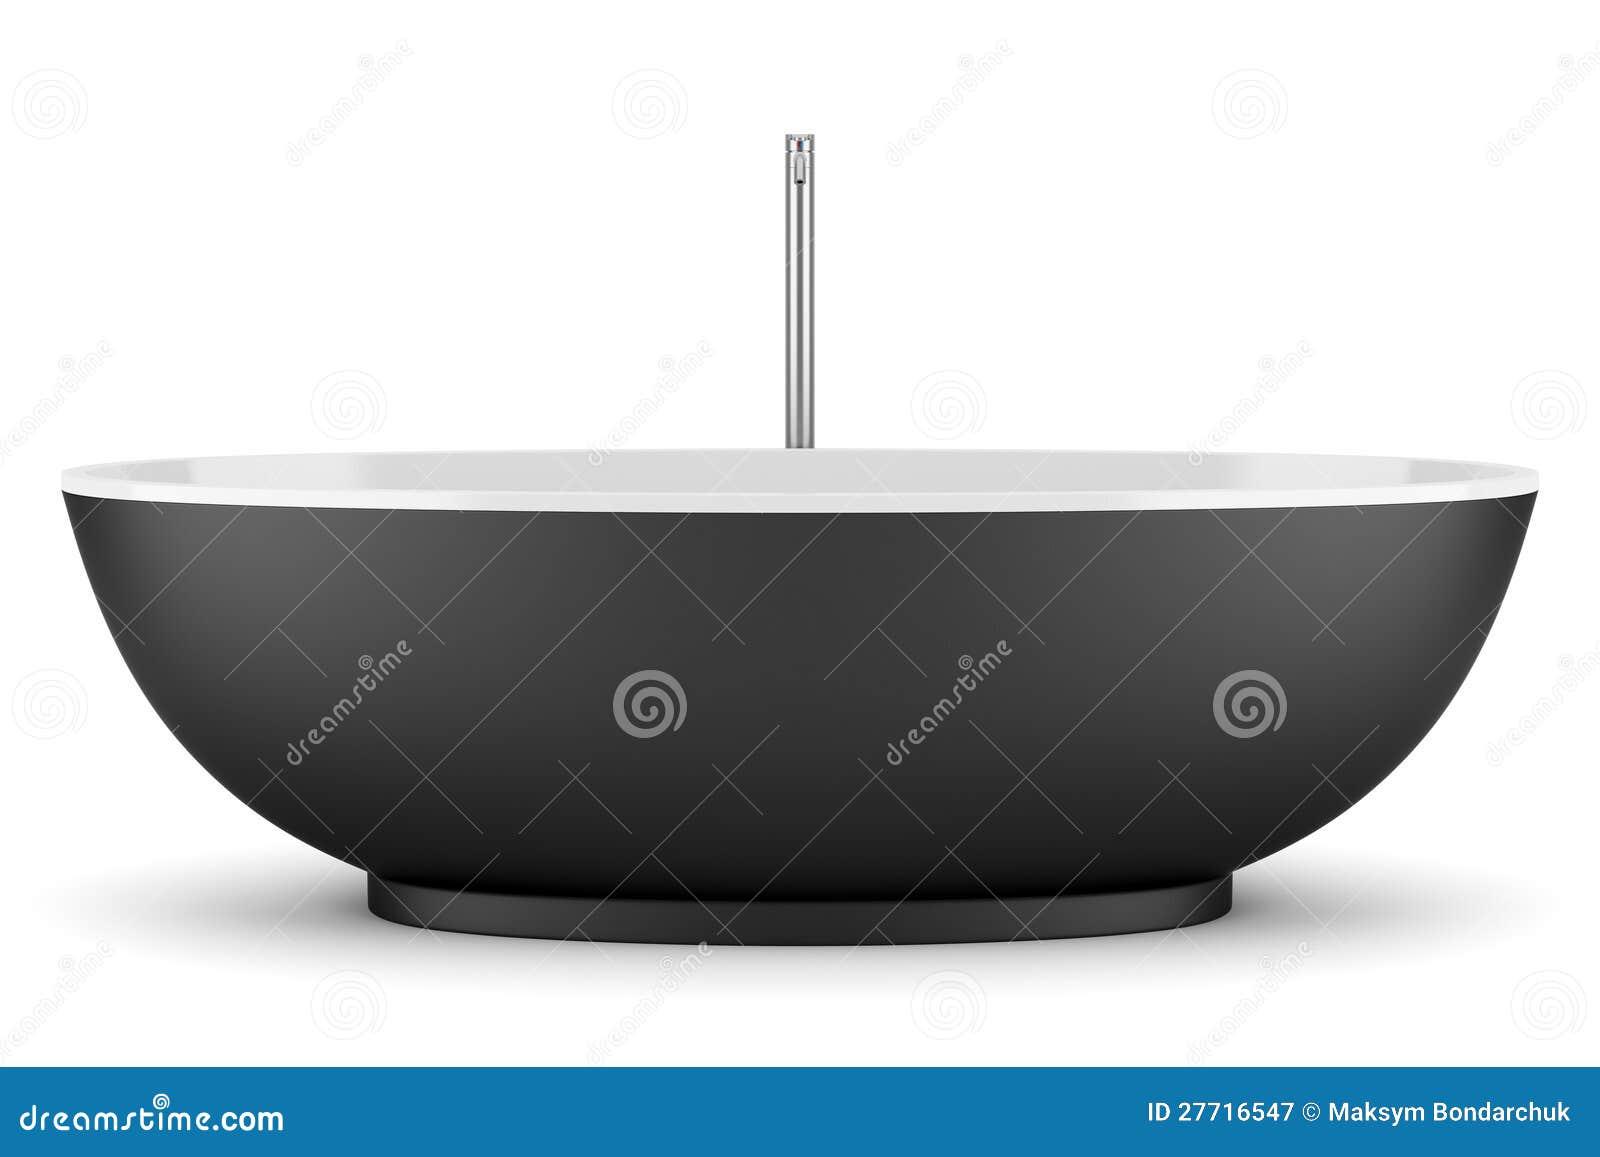 Vasca Da Bagno vasca da bagno nera : Vasca Da Bagno Nera Moderna Isolata Su Bianco Fotografia Stock ...